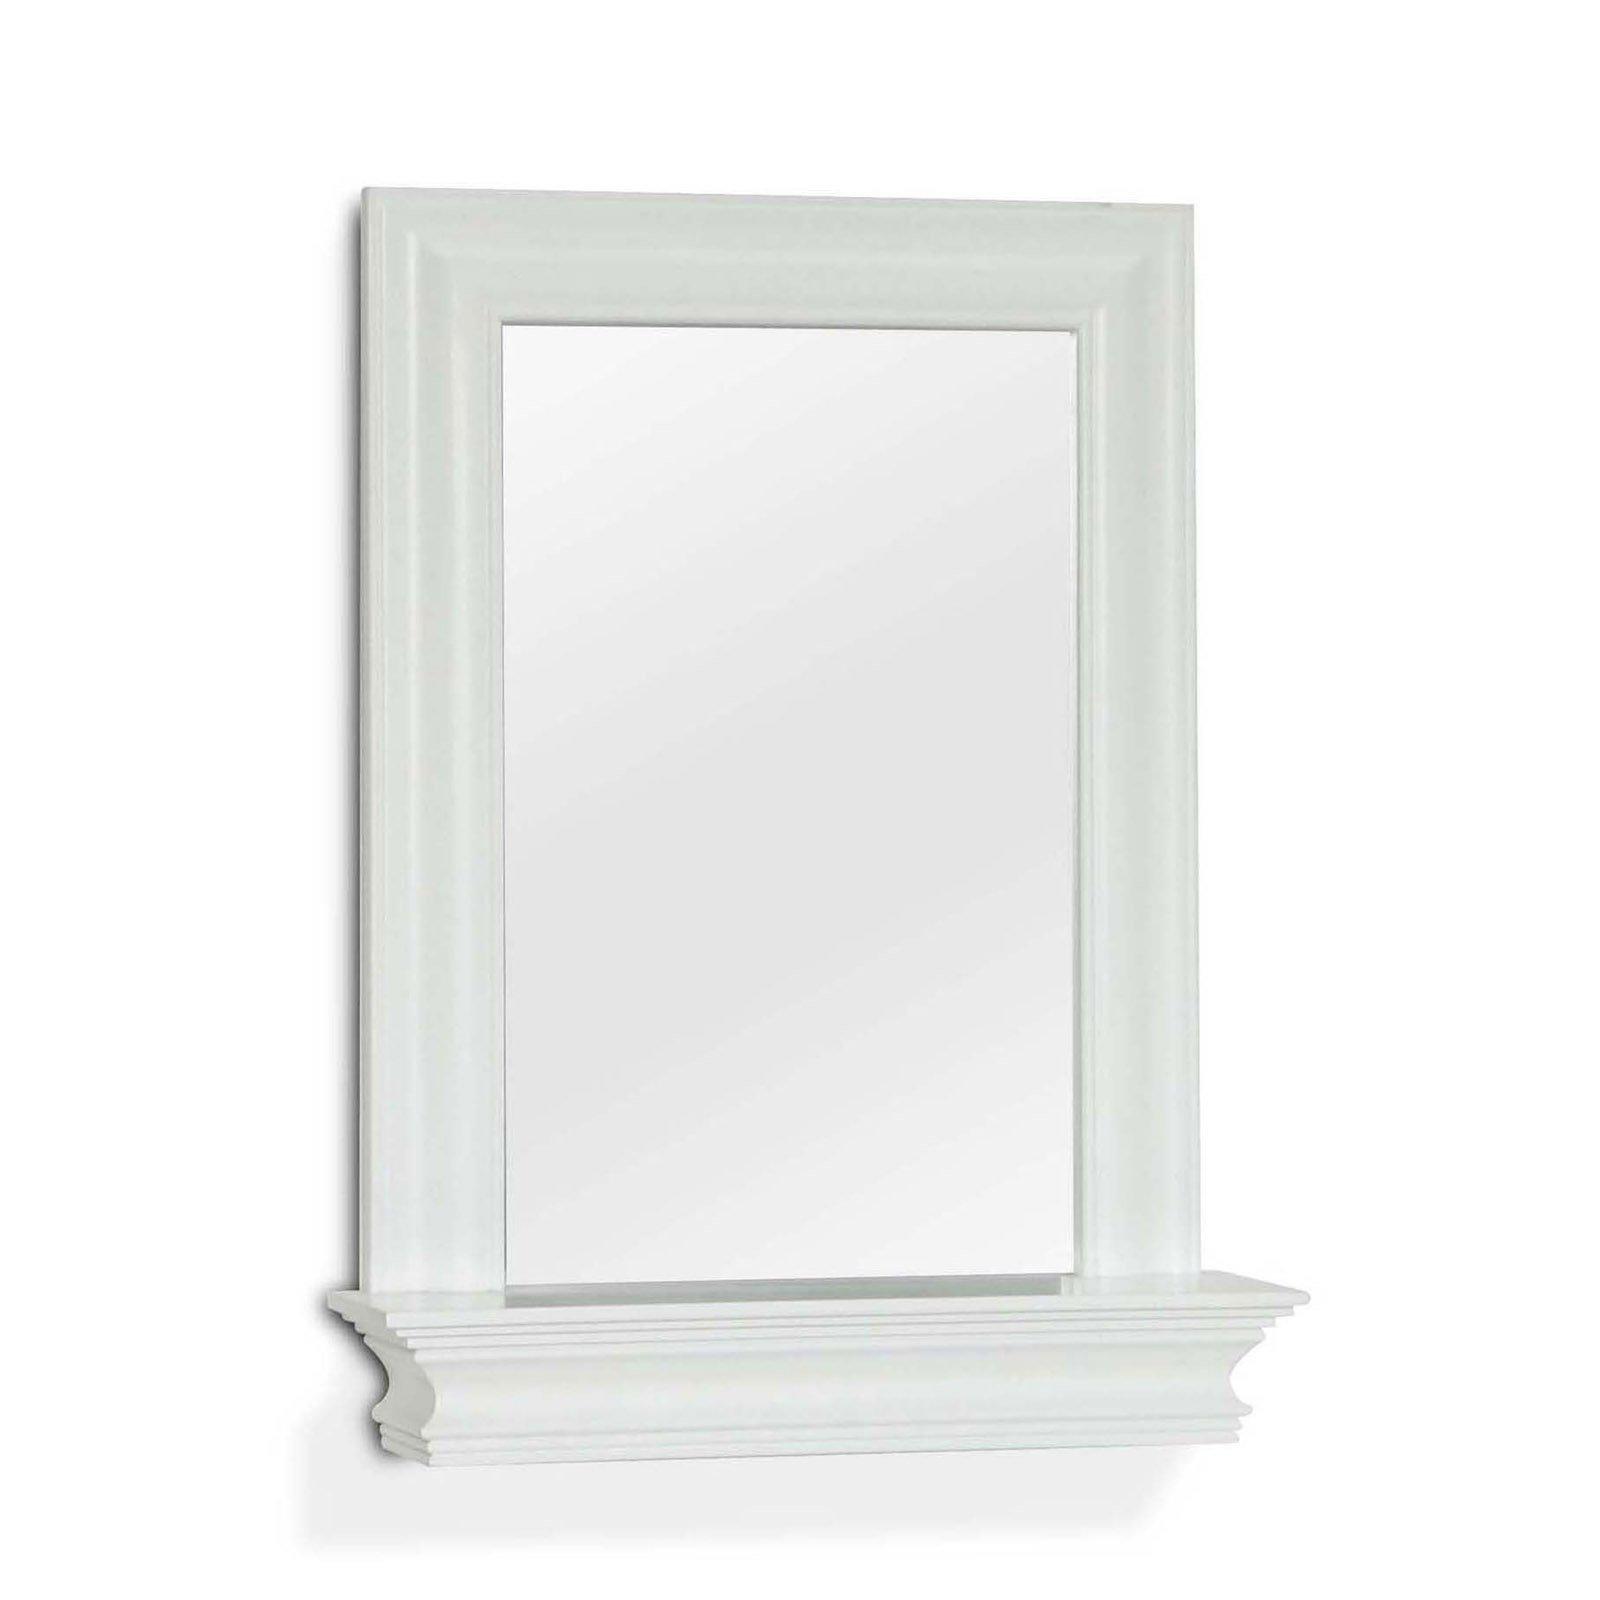 Stratford Wall Mirror with Shelf - 18W x 24H in.